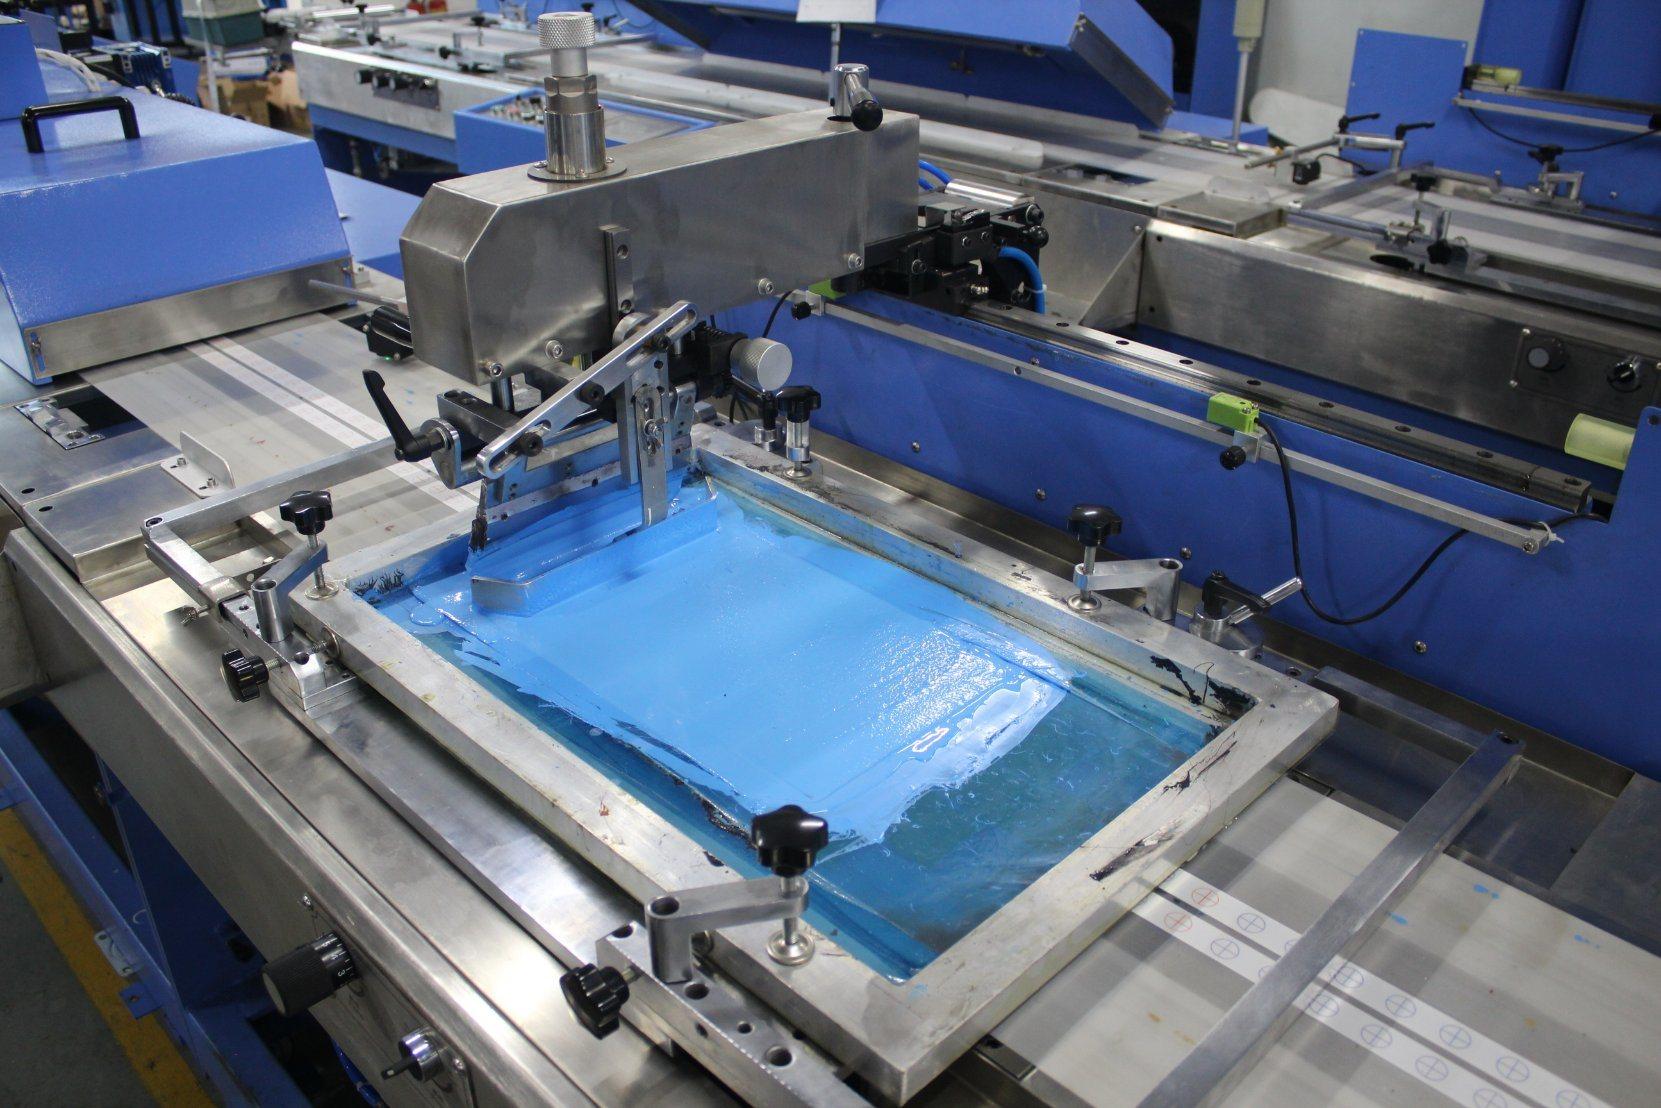 2 Koloroj Clothing Labels Aŭtomata Screen Printing Maŝino kun Ce